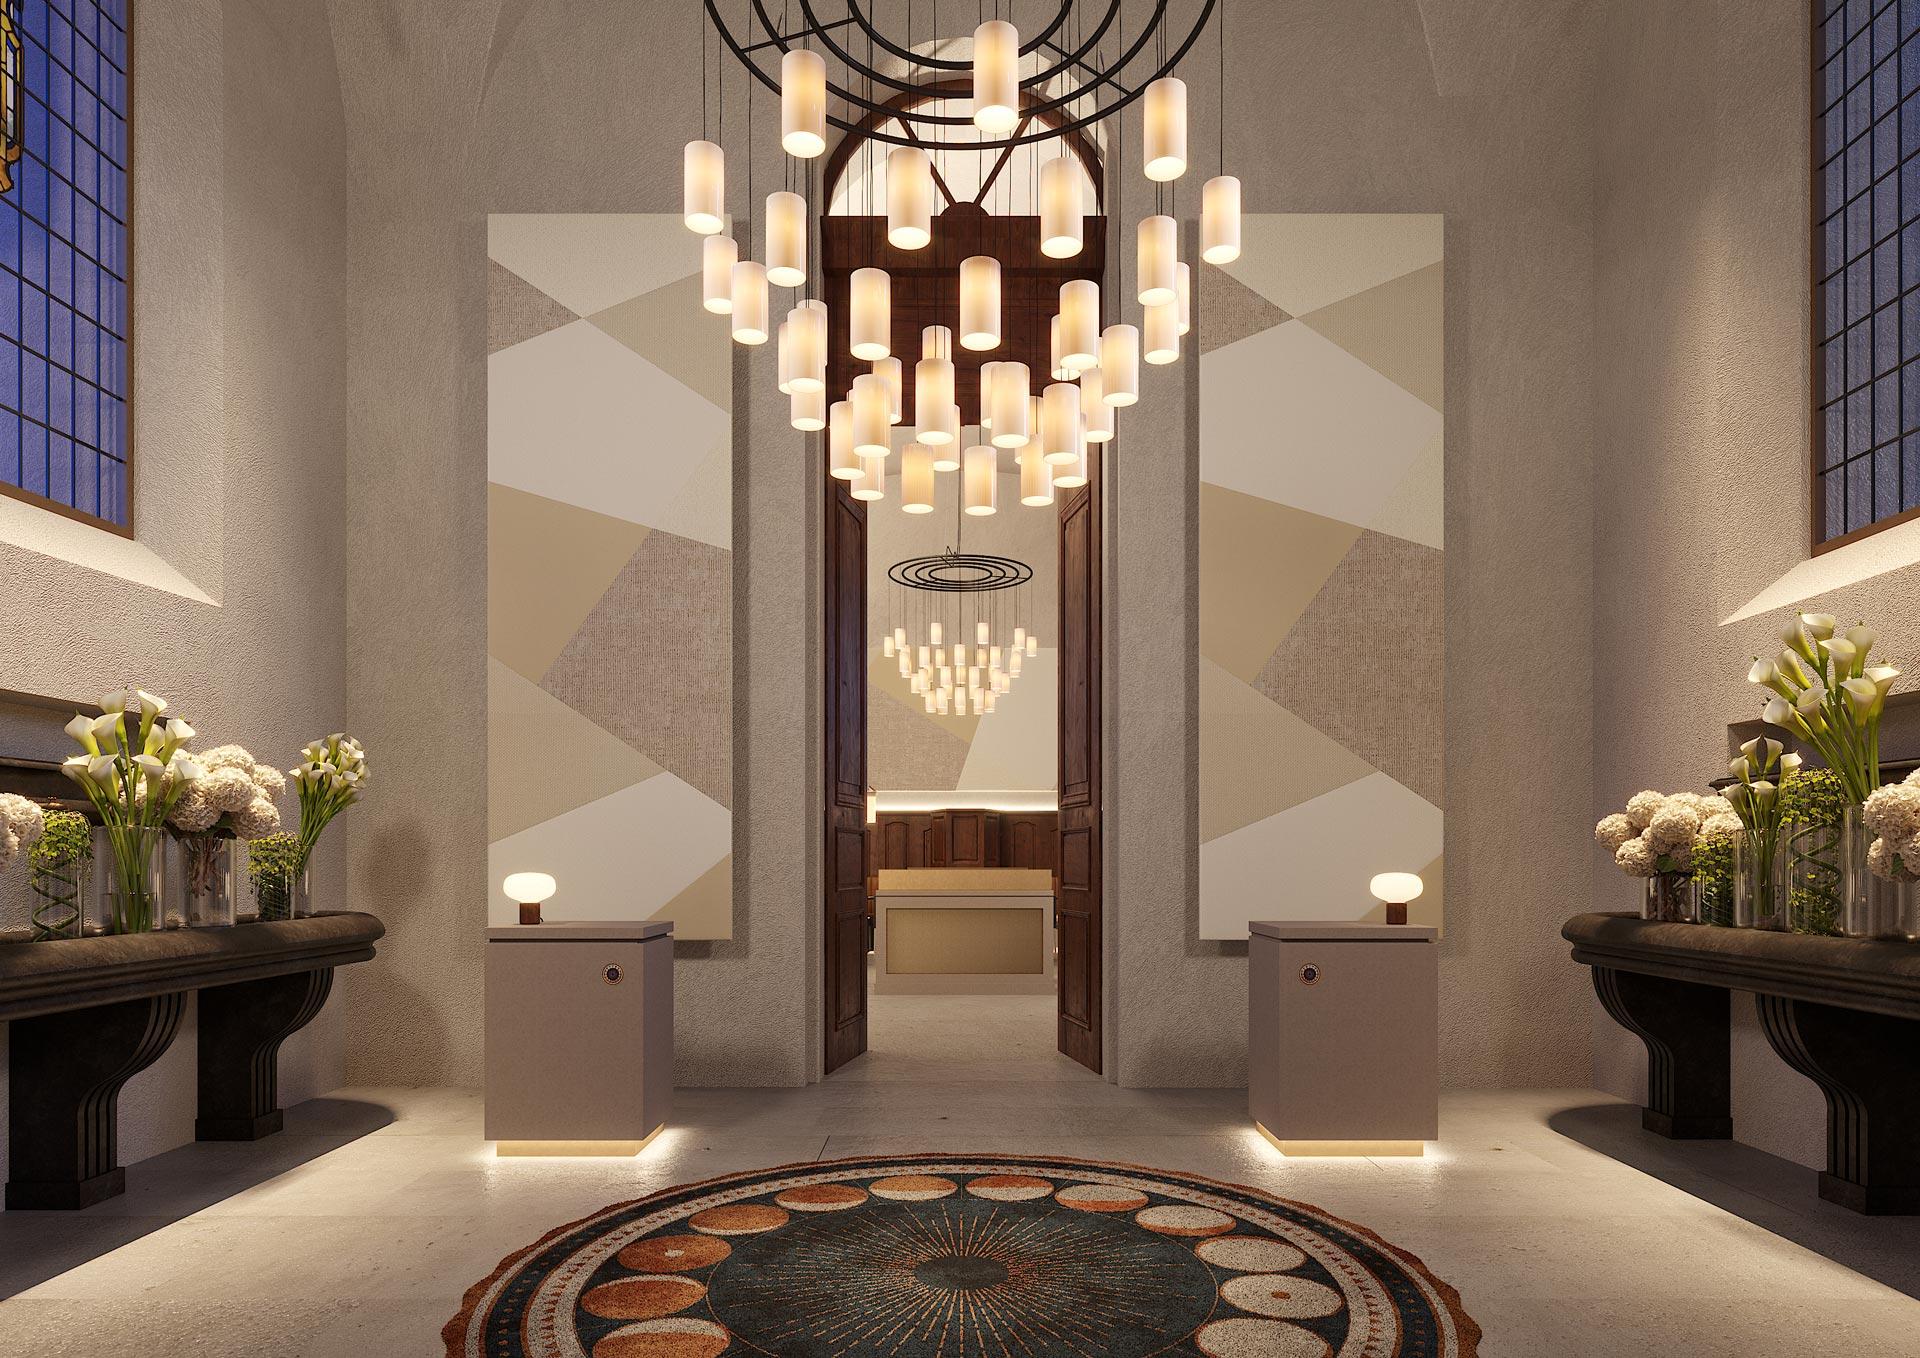 Grand hôtel Dieu - Perspective 3D